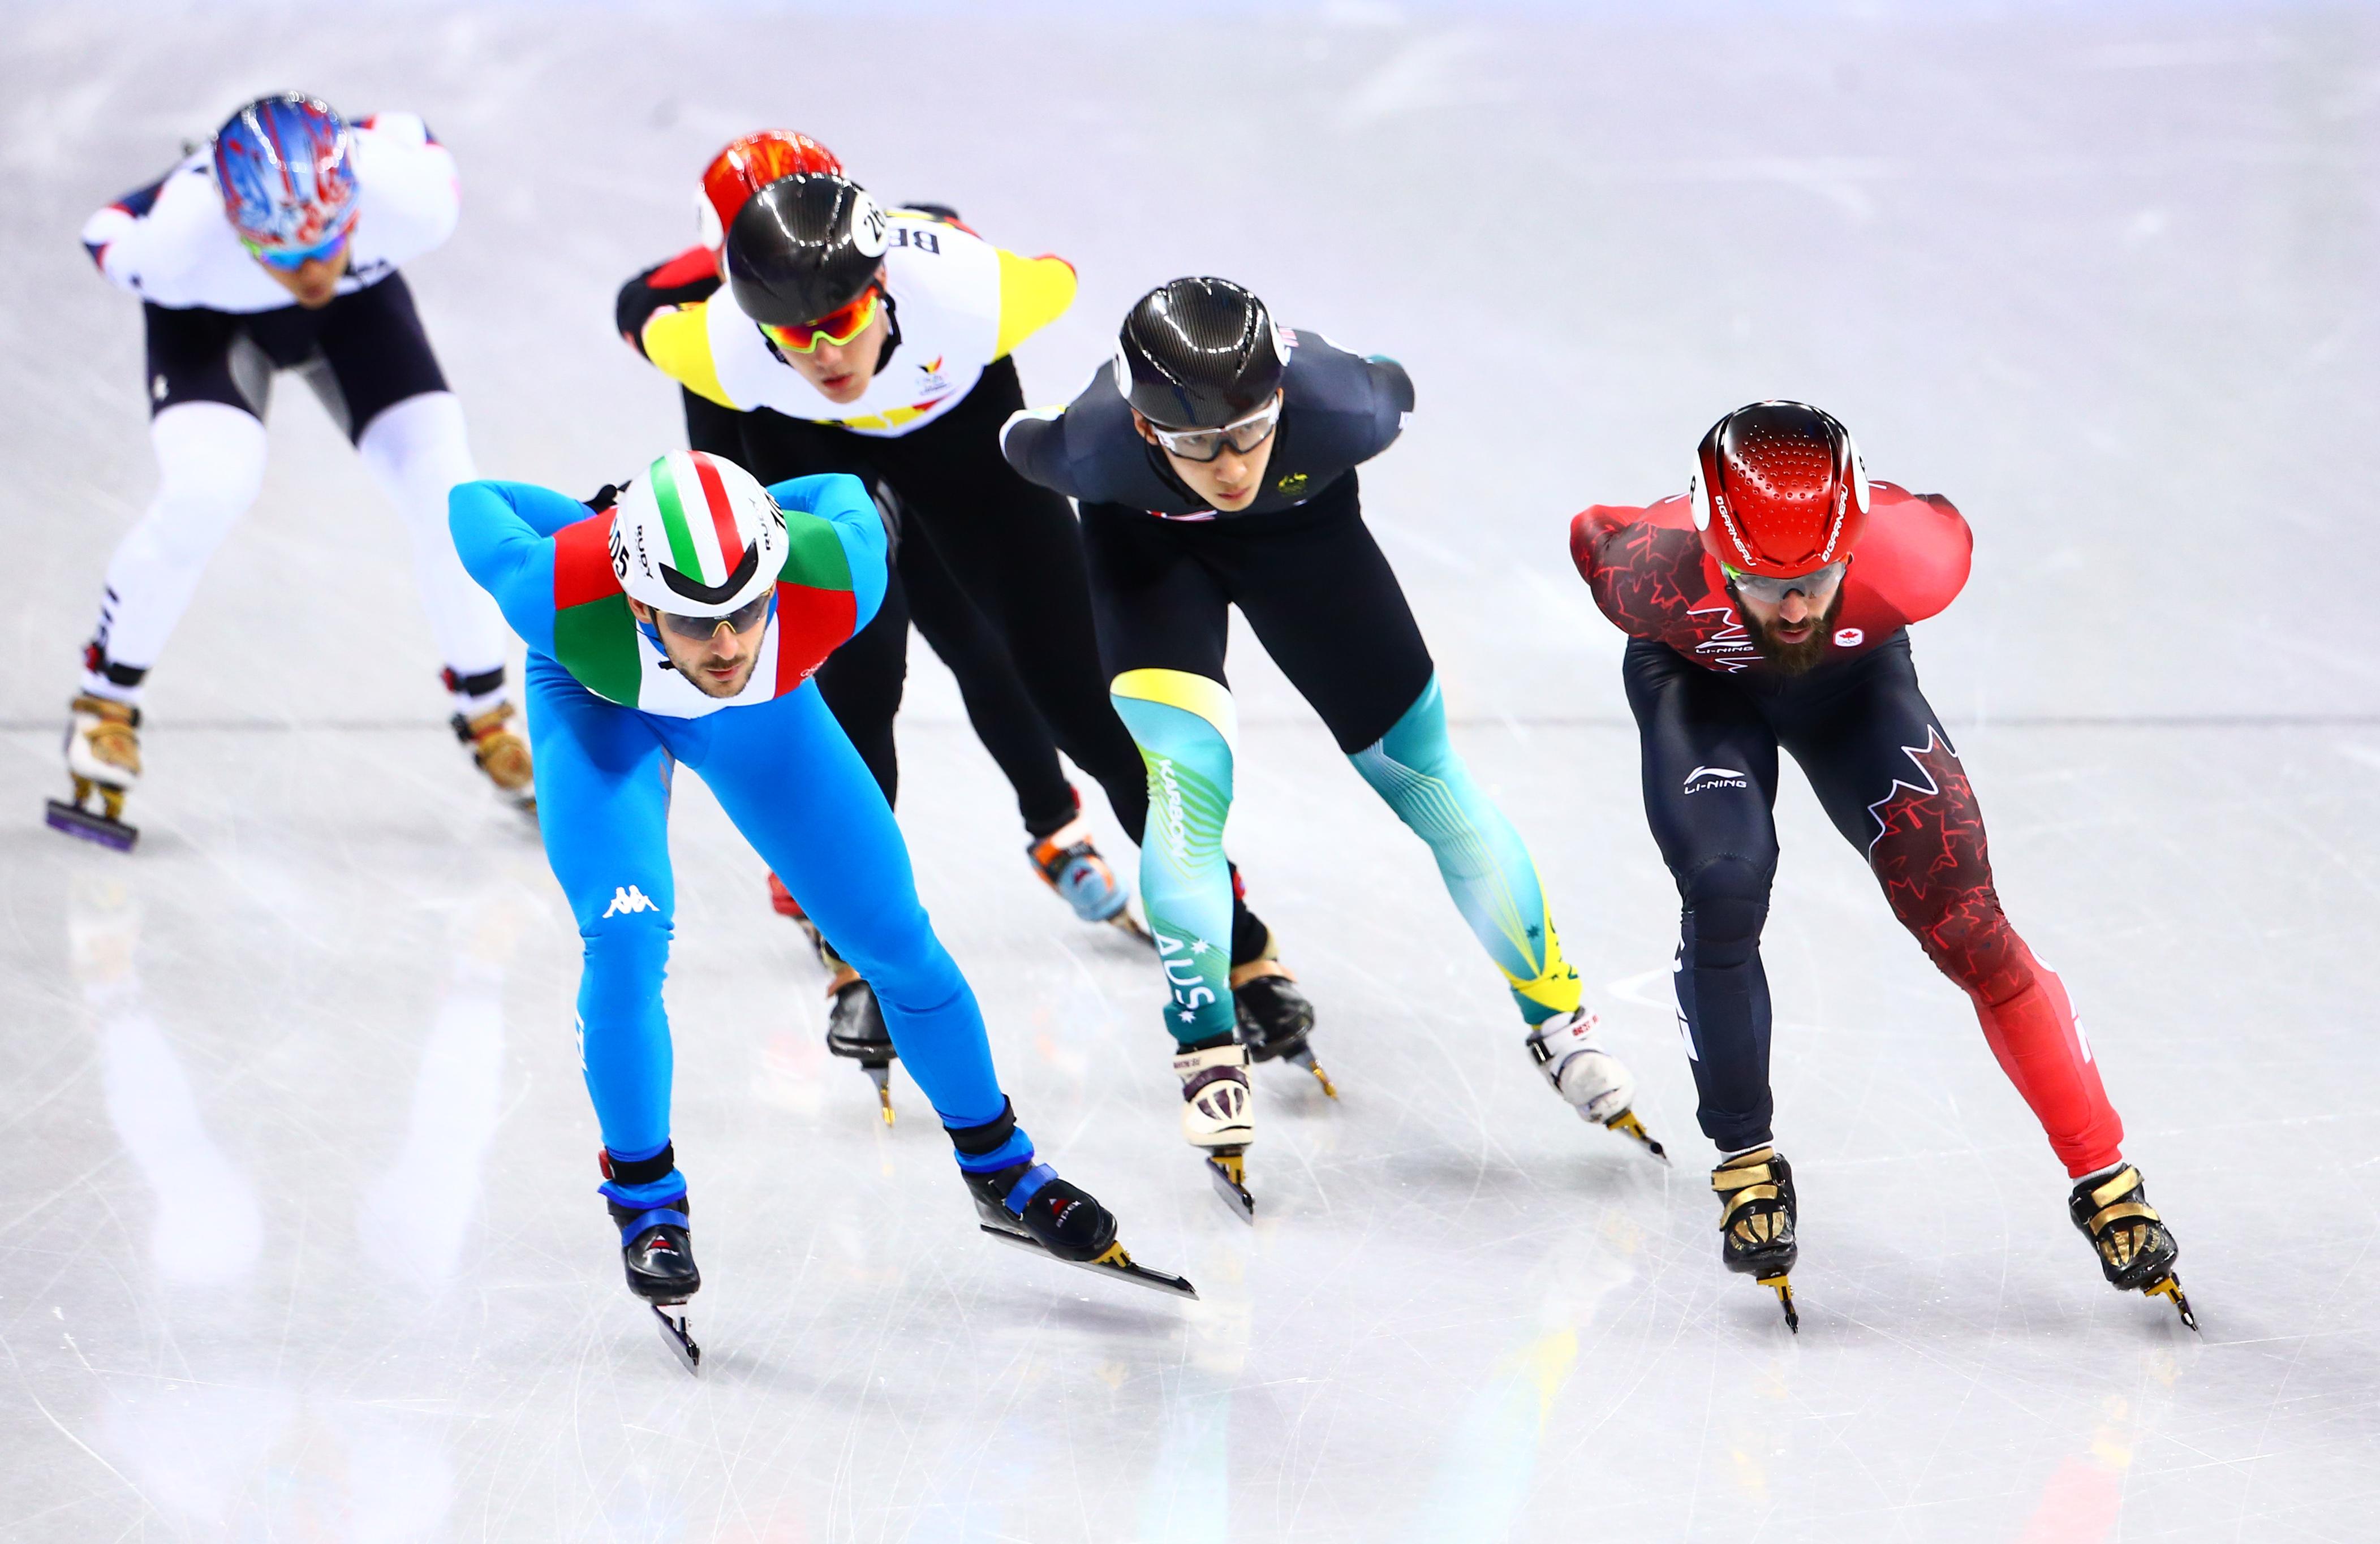 team-canada-hamelin-1500m-pyeongchang